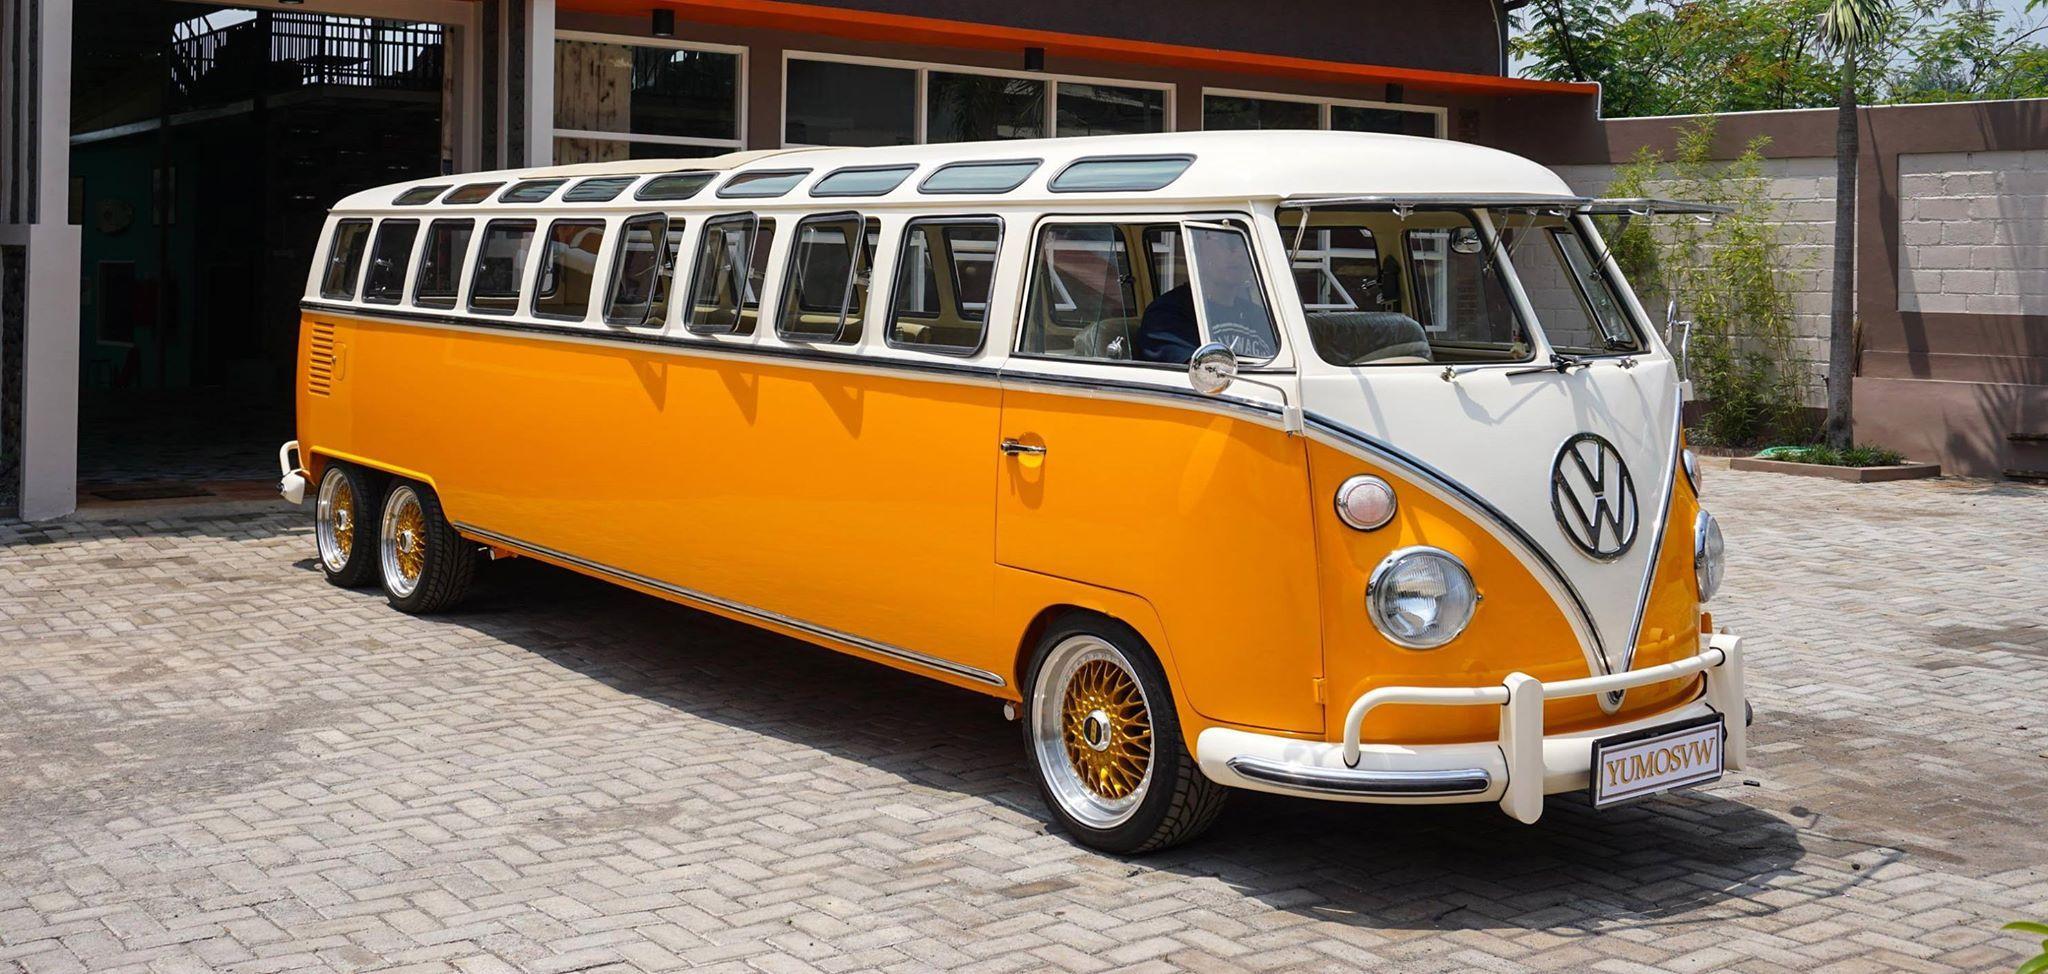 t1 vw samba bus 39 39 limousine 39 39 vw bus model t1 and t2. Black Bedroom Furniture Sets. Home Design Ideas